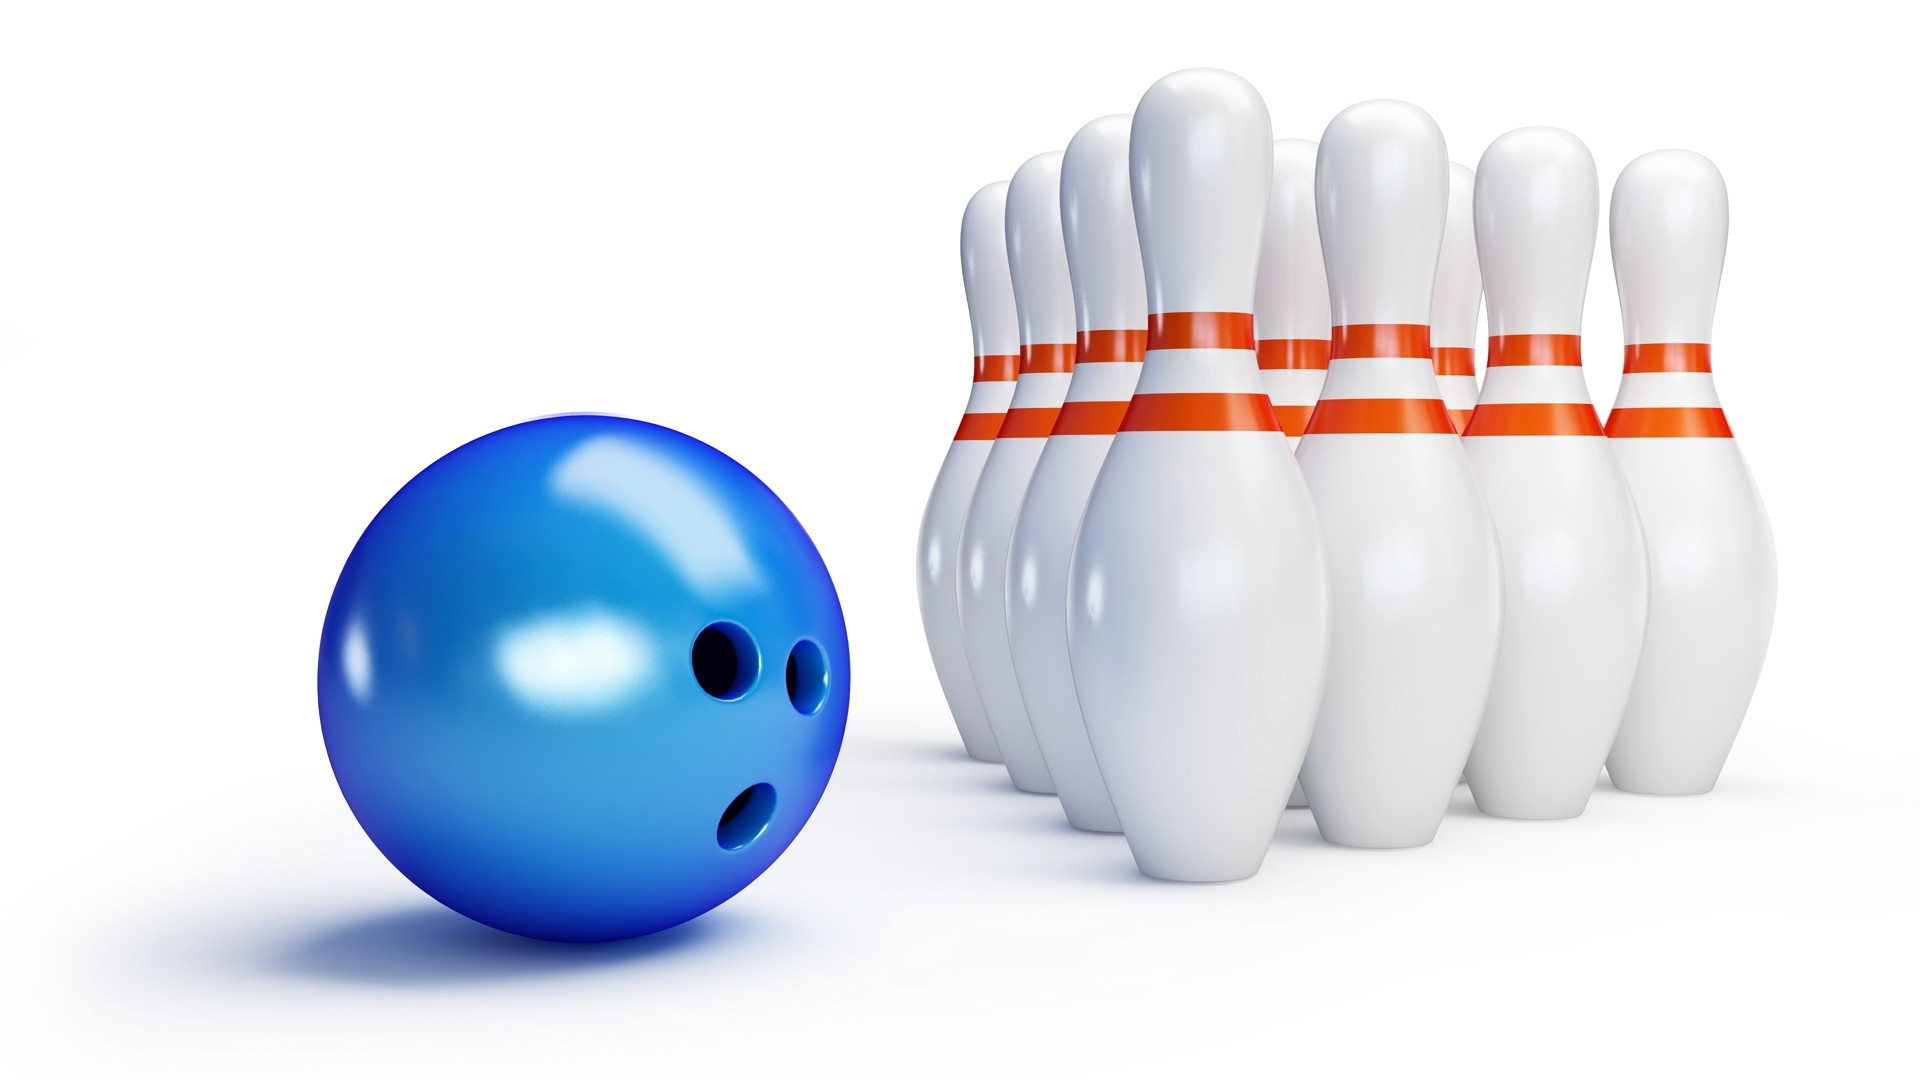 Sports - Bowling Wallpaper - Bowling Ball PNG HD